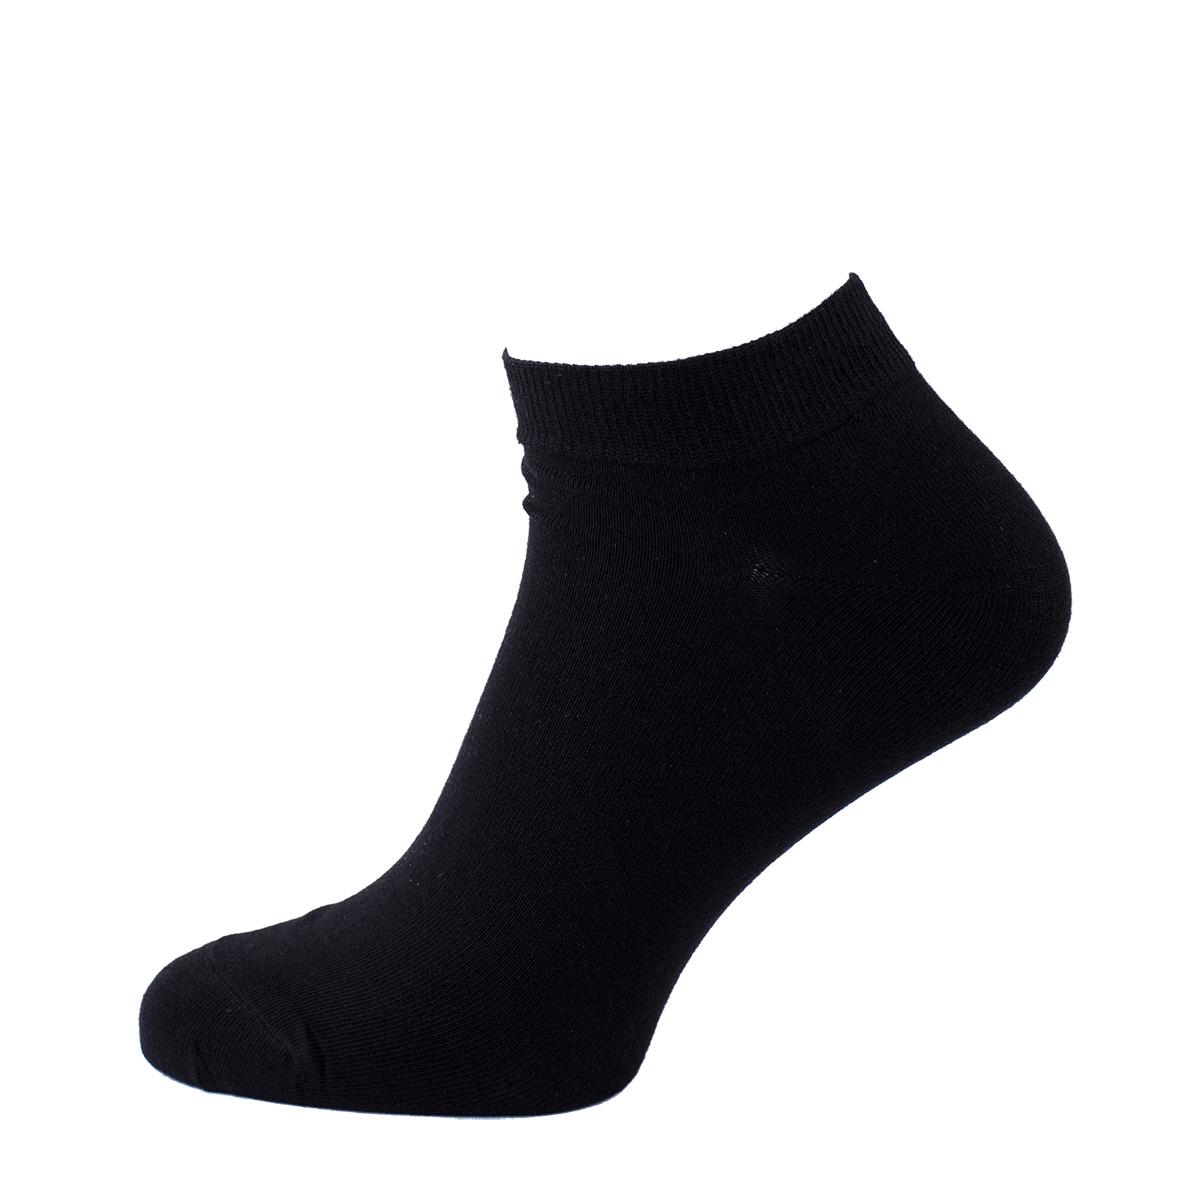 65441235e38 Zapana Pánské jednobarevné kotníkové ponožky Bite černé - Glami.cz